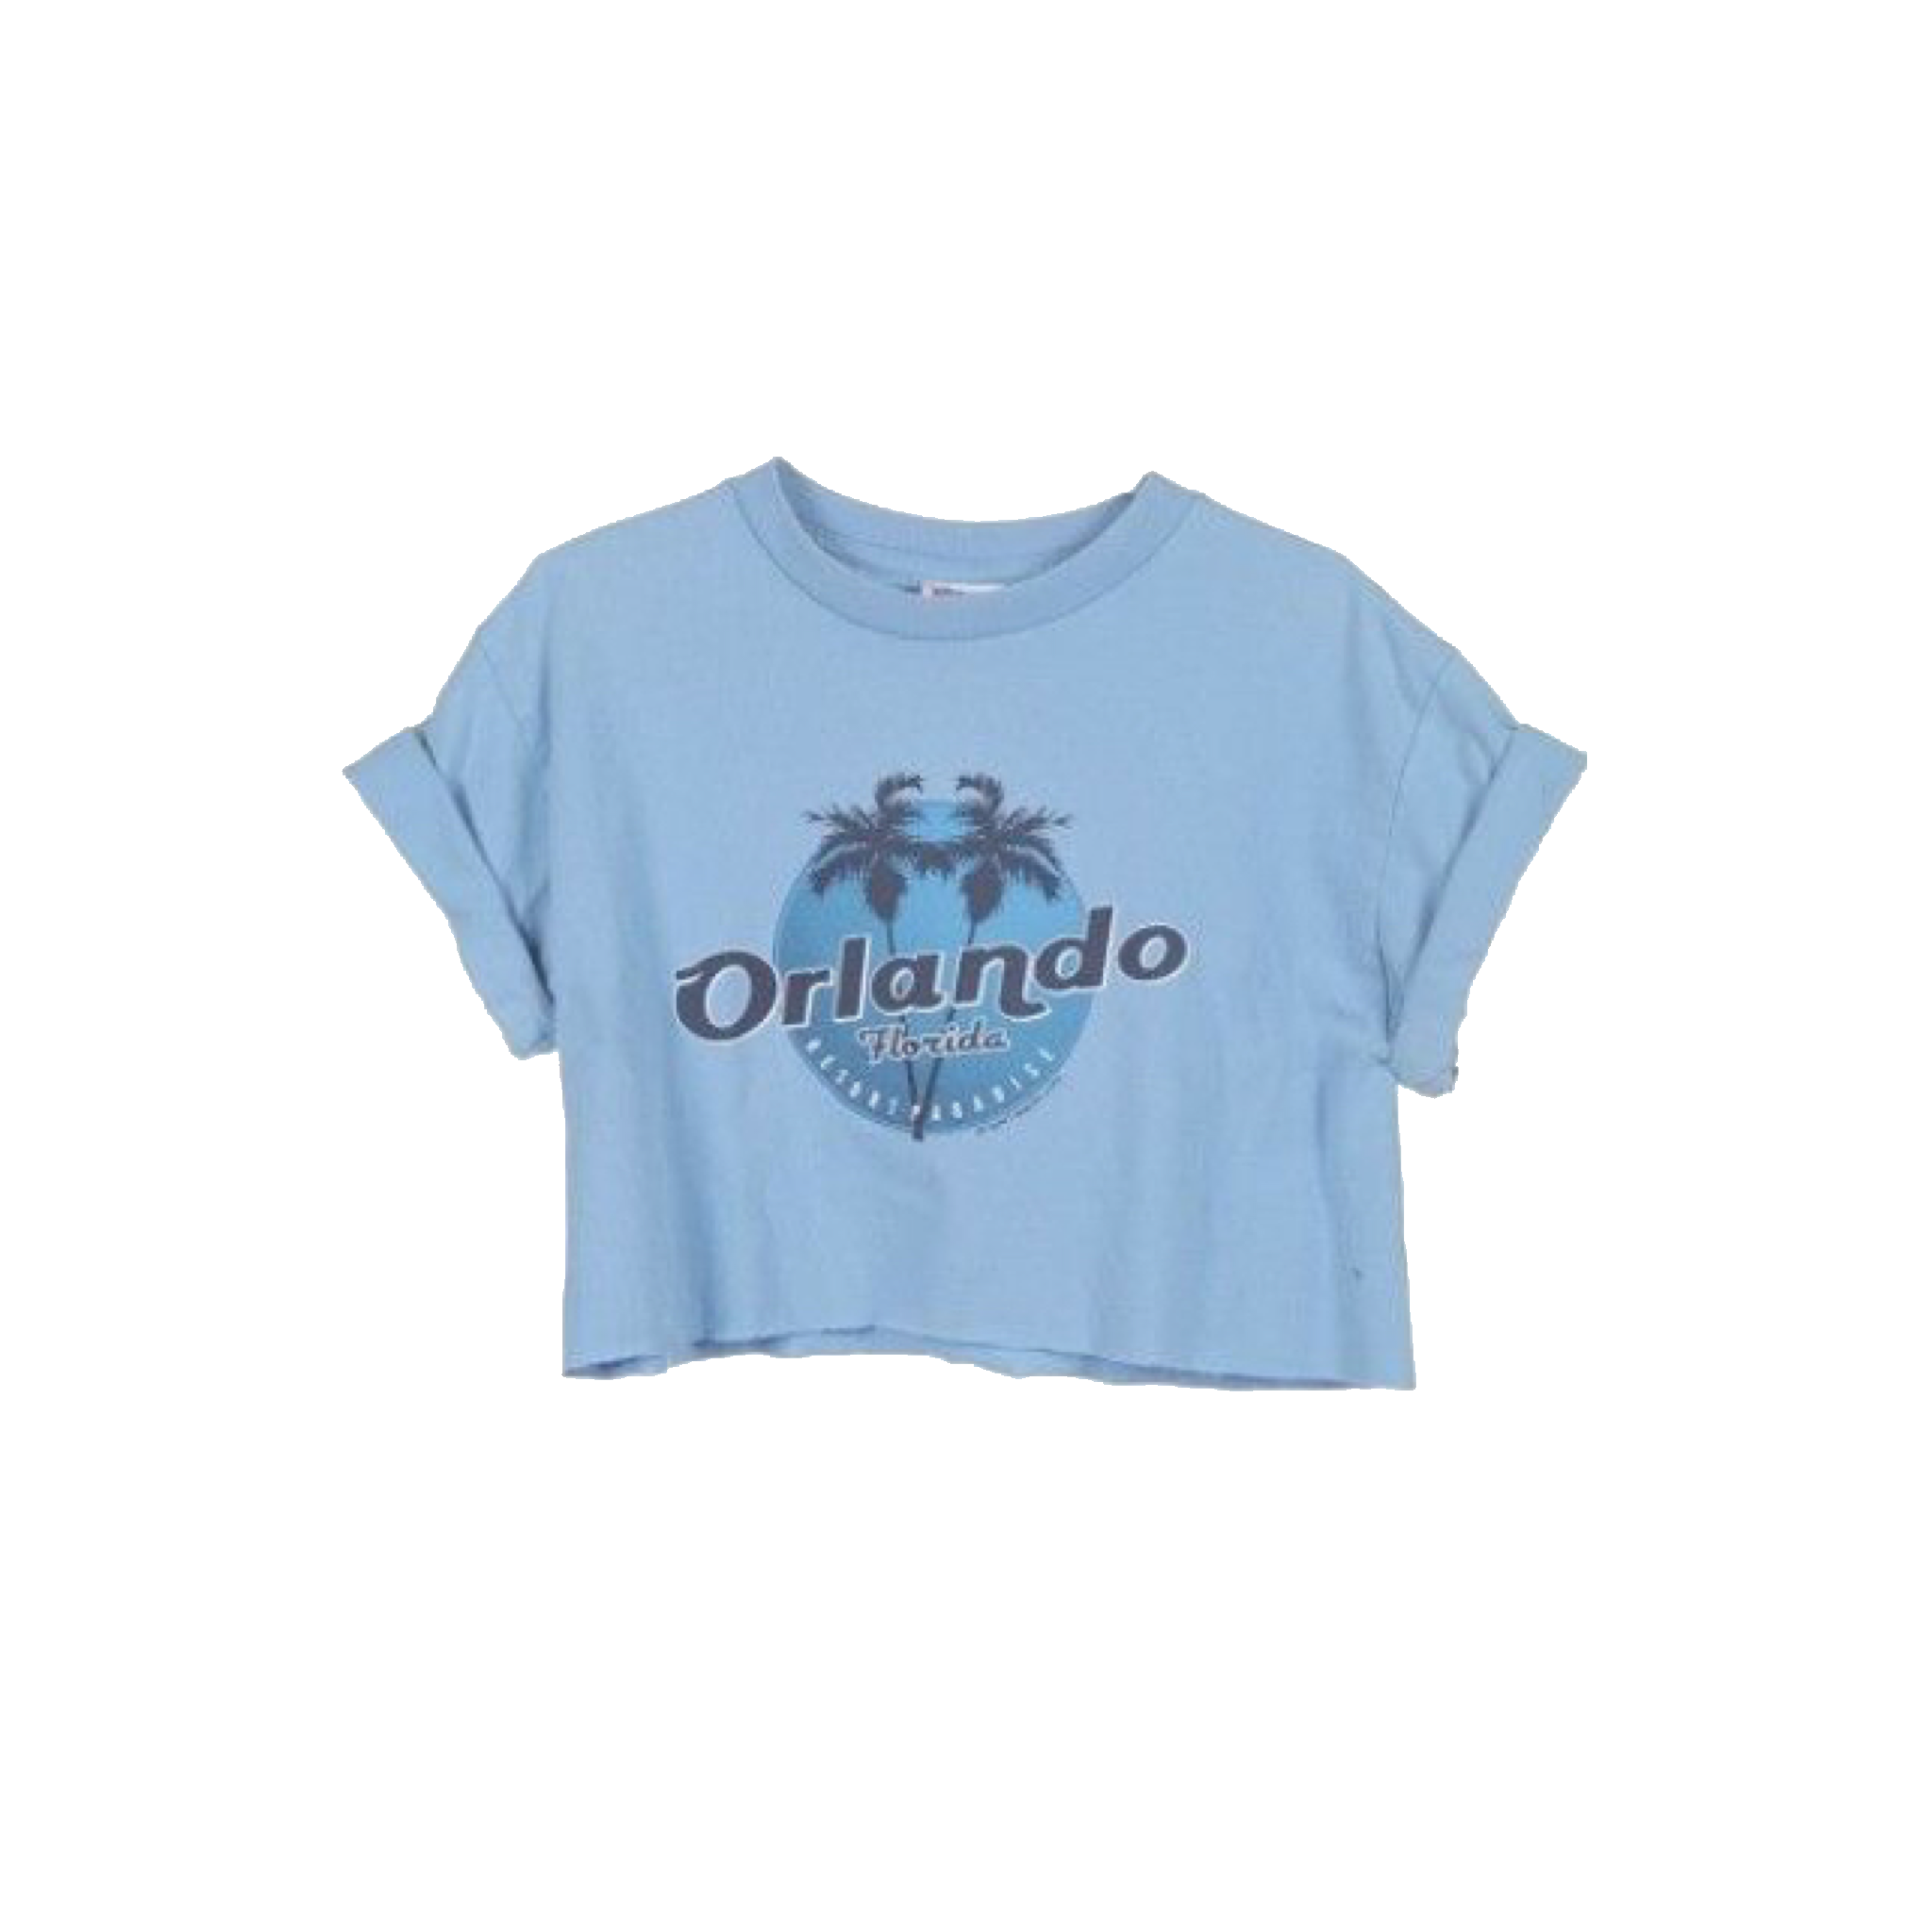 Blank Tee Shirts Vector Blue Google Search Kaos Baju Kaos Biru Dongker